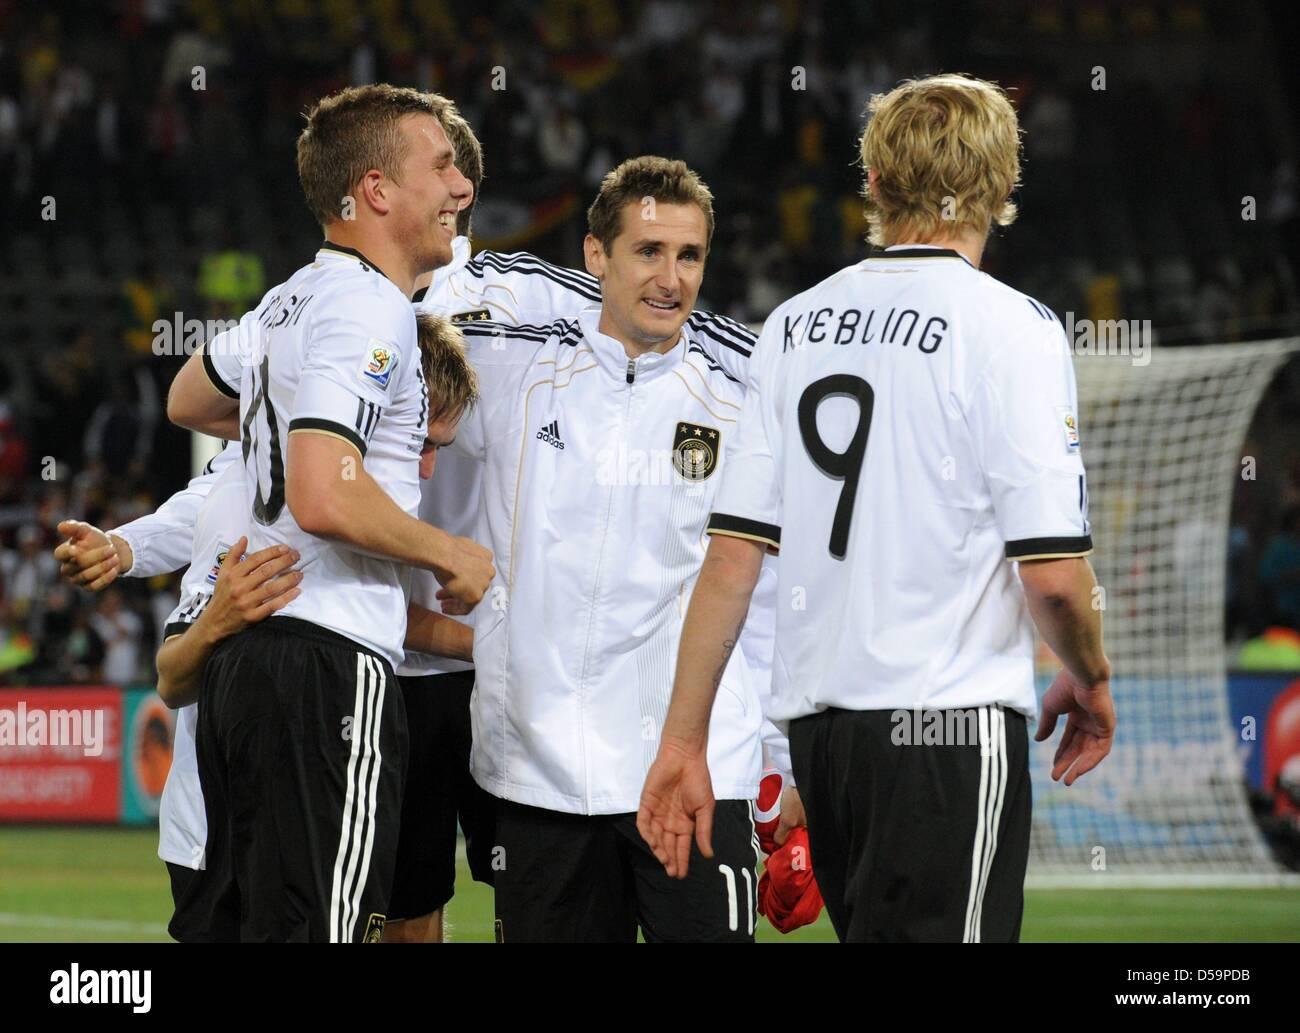 Miroslav Klose And Philipp Lahm Stock Photos   Miroslav Klose And ... ec97f19e7611b